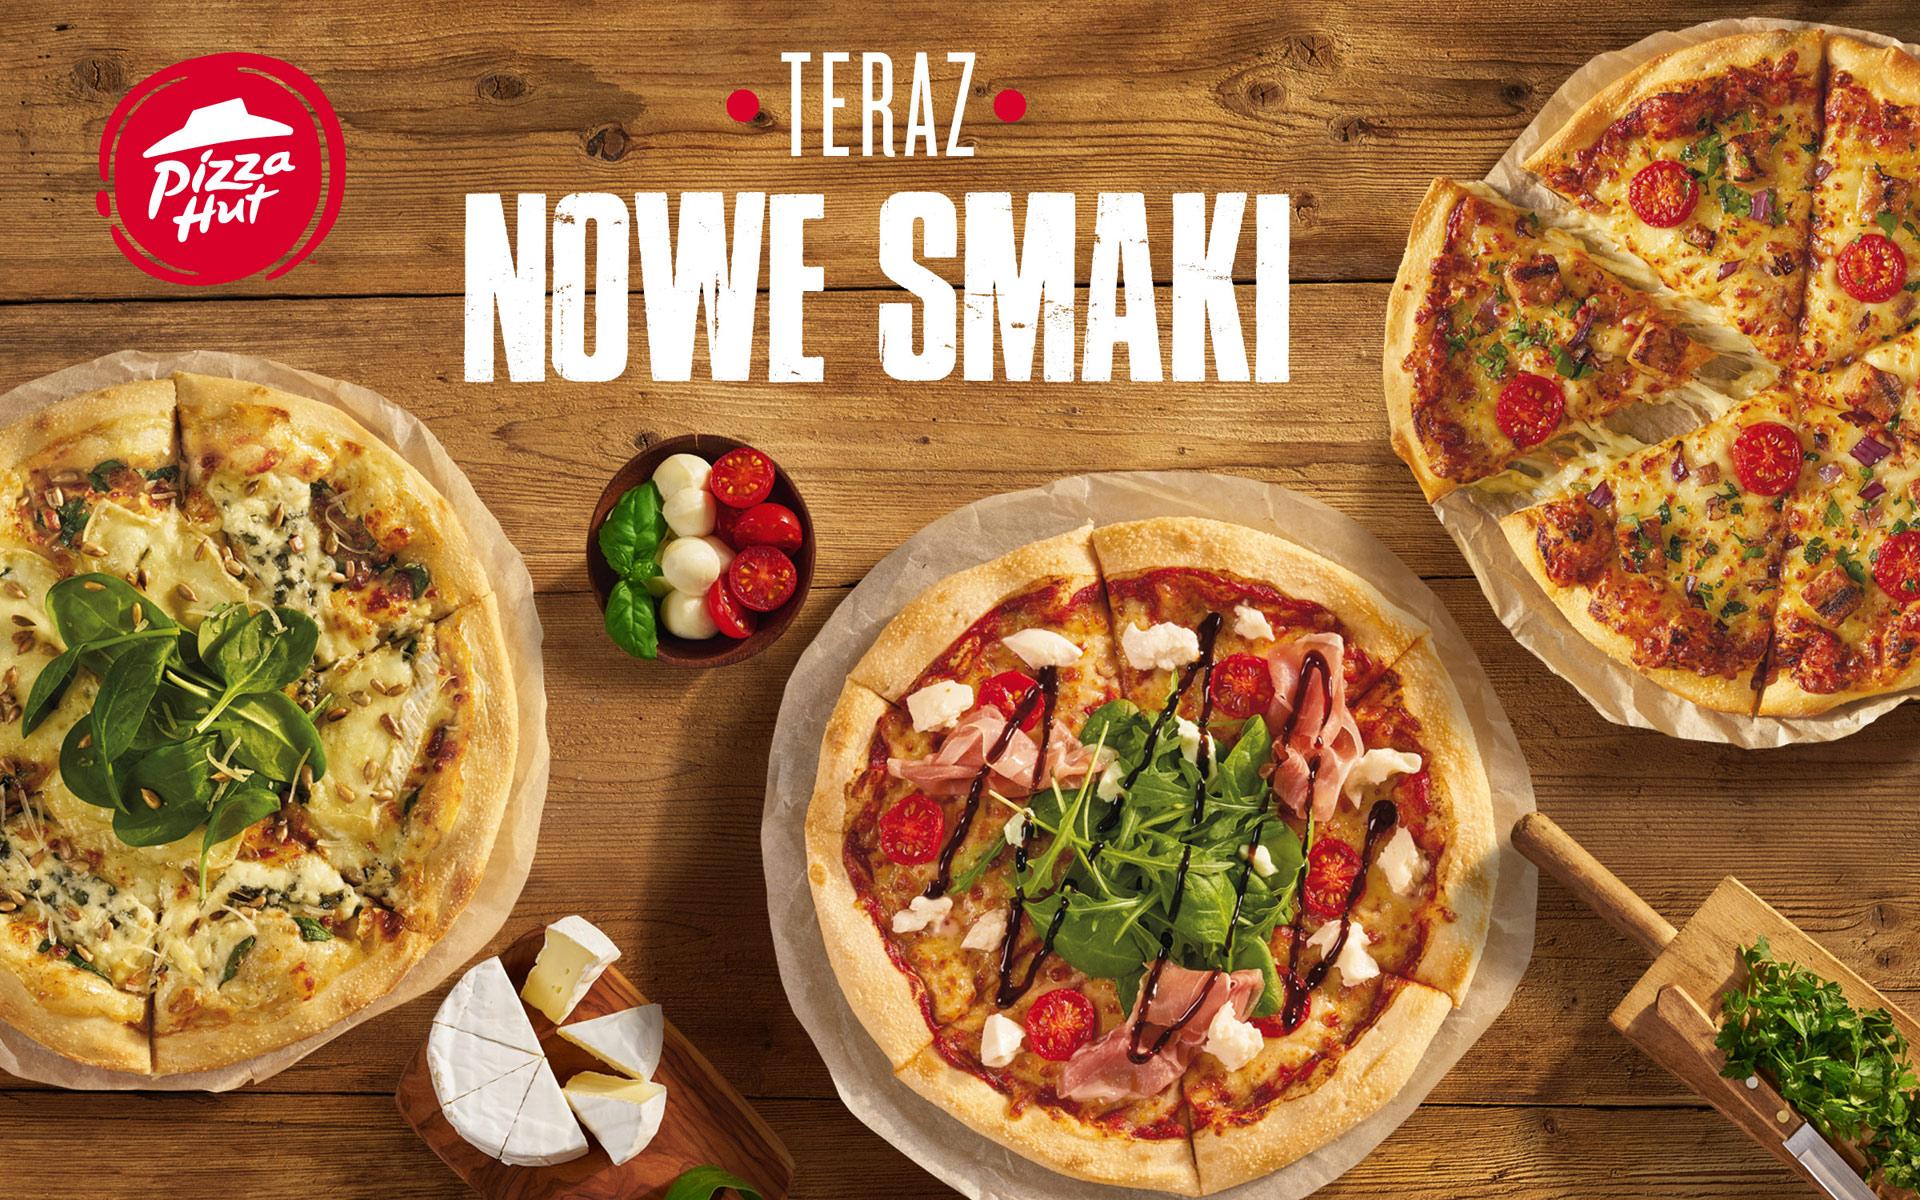 Pizza Hut Nowe Smaki